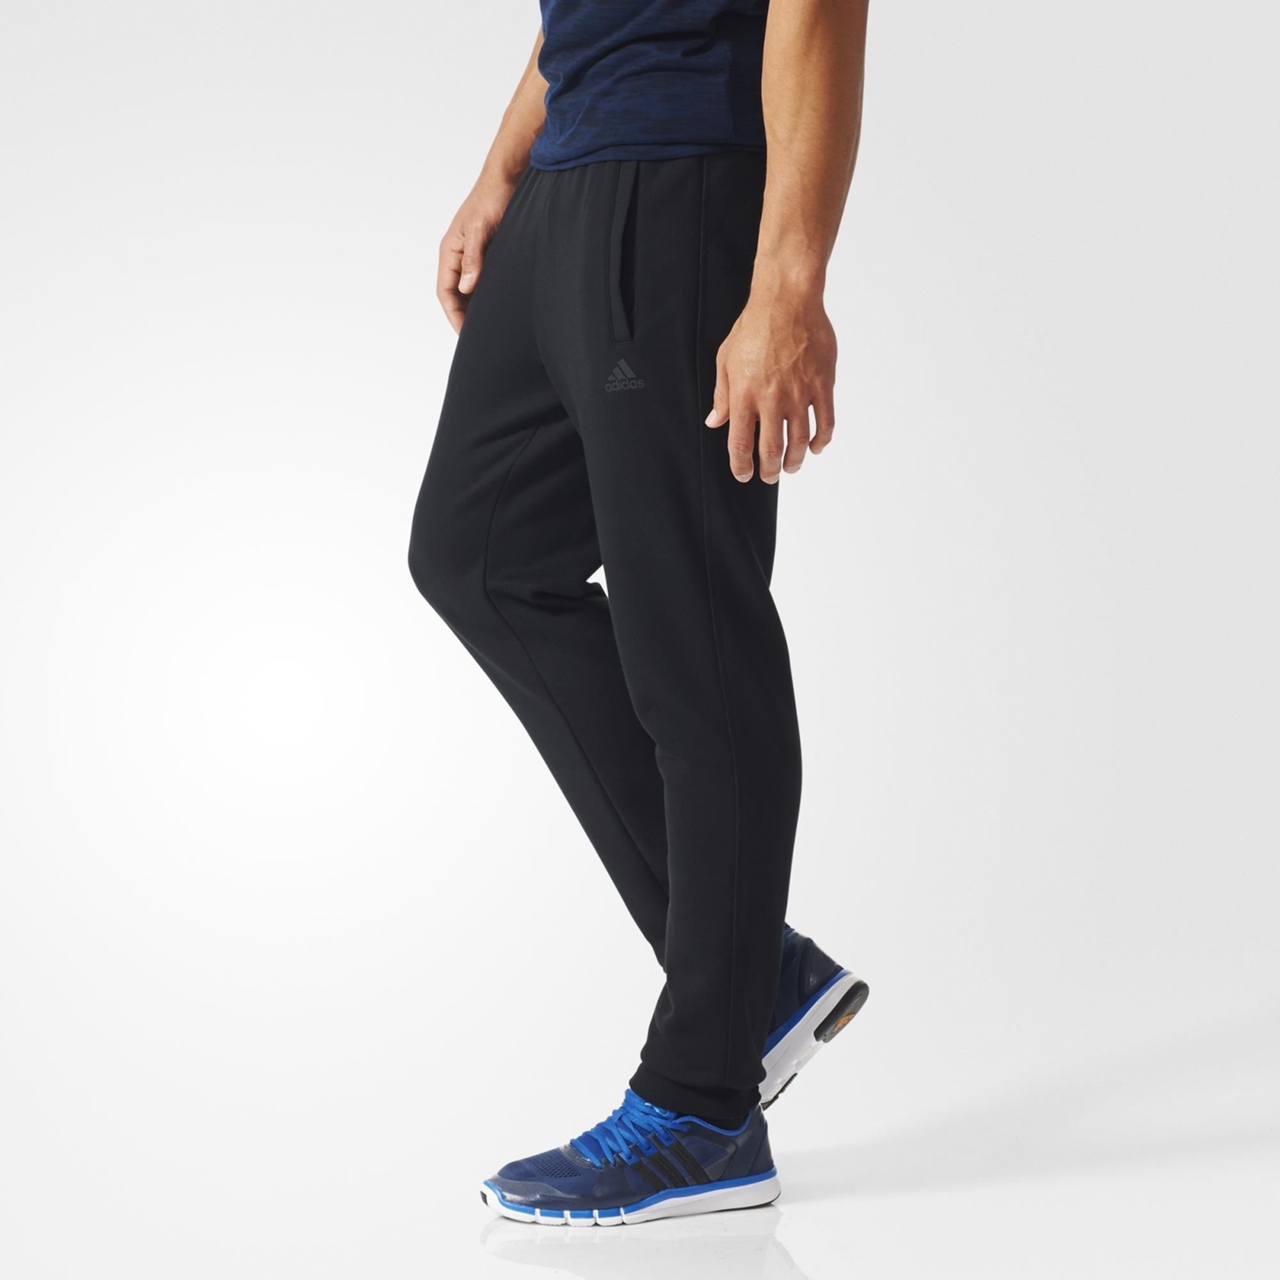 Men's Track Pants (Sizes 46-54 Eur)